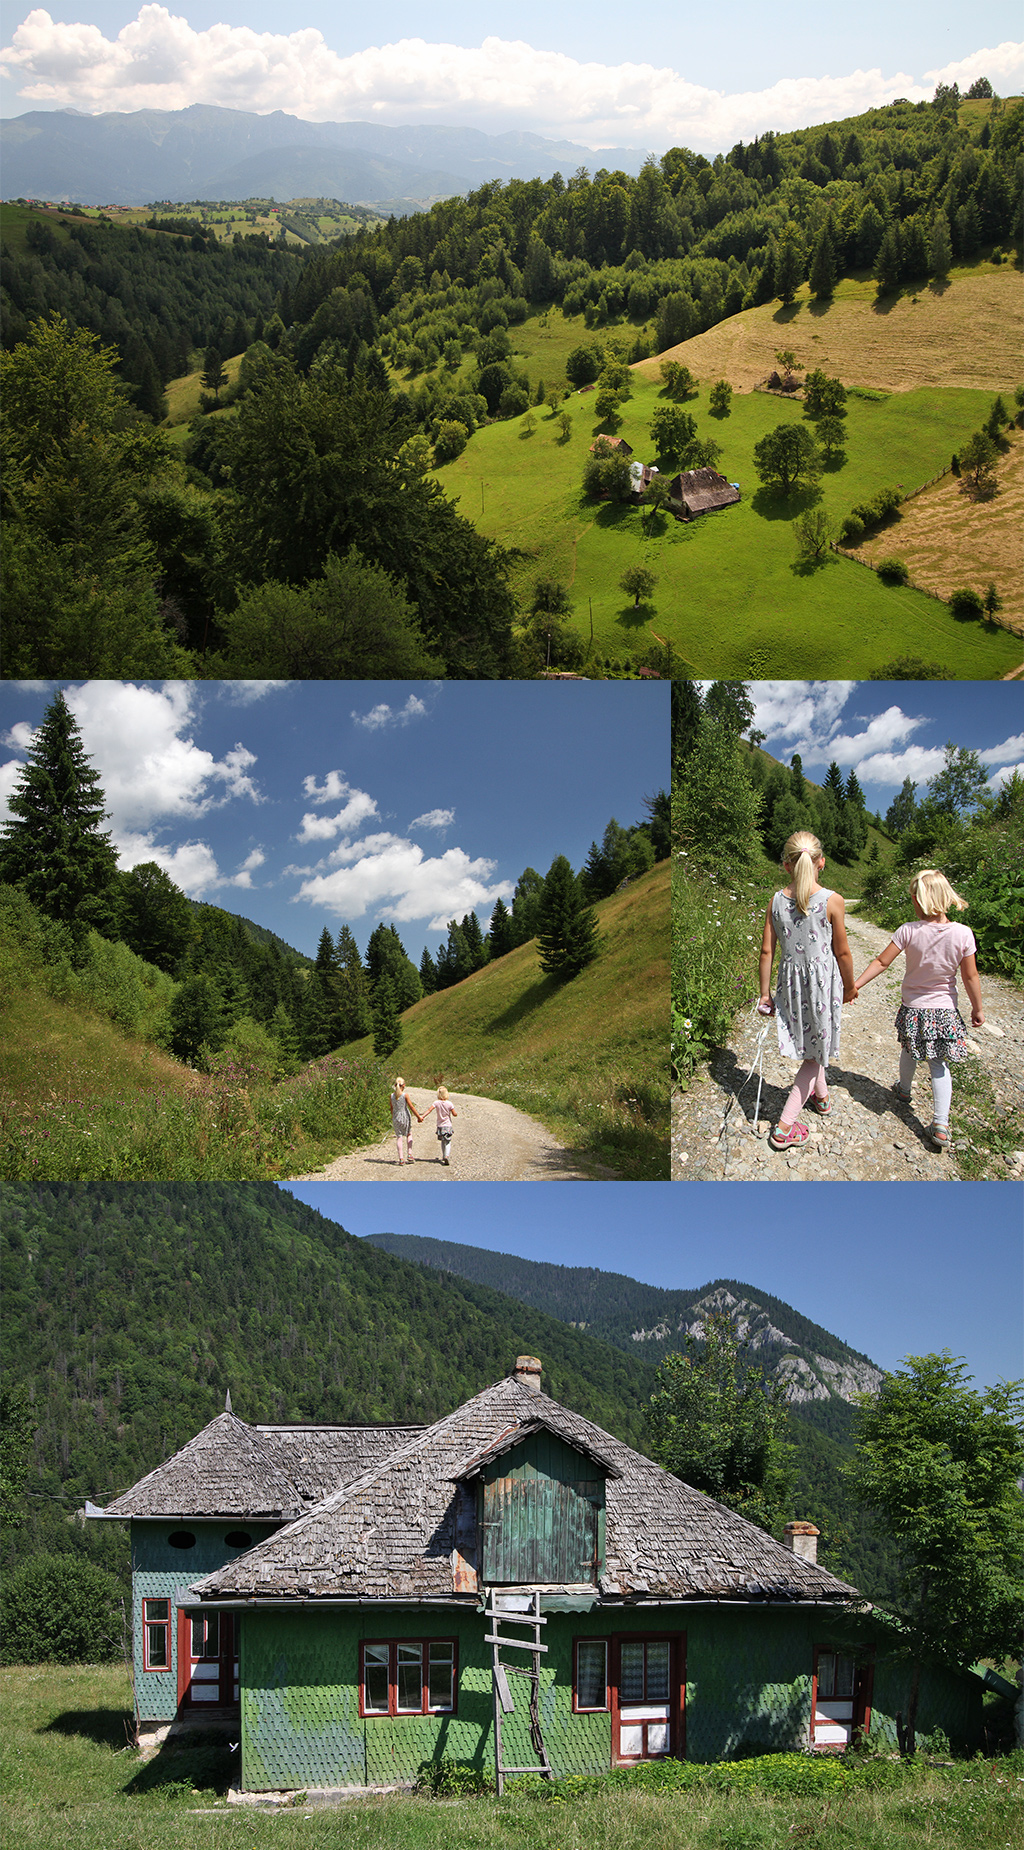 Nationaal park Piatra Craioului bij Brasov